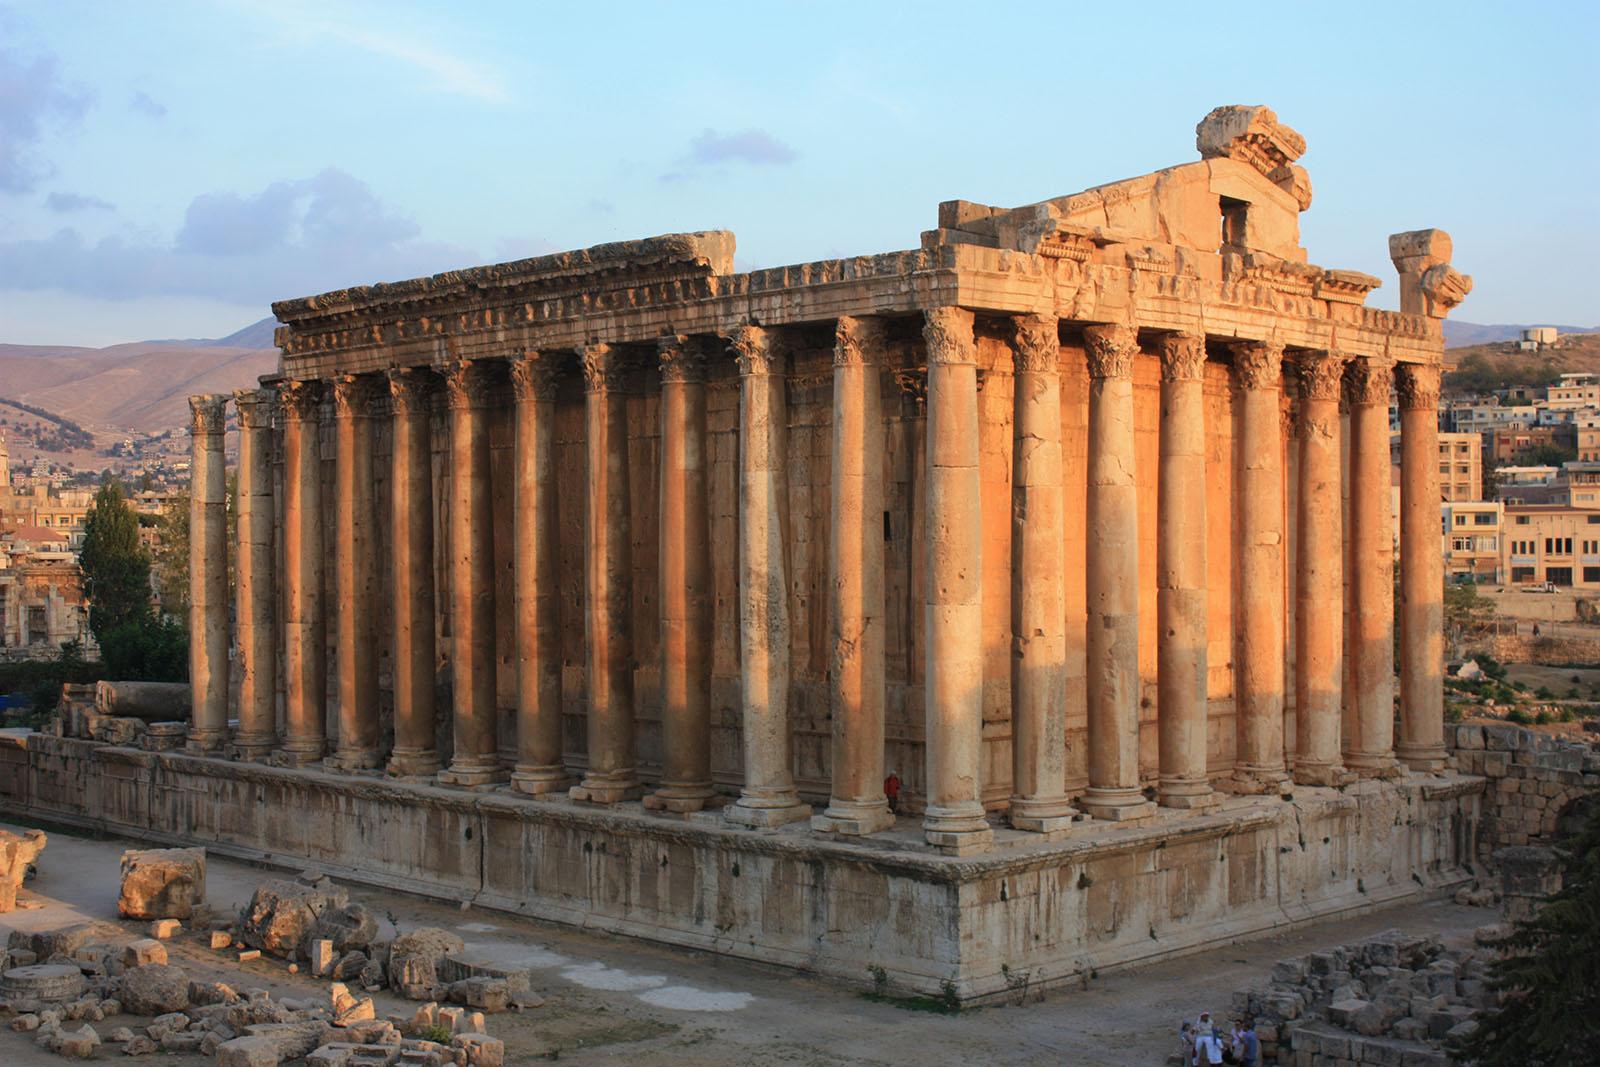 Temple of Bacchus in Baalbek, Lebanon